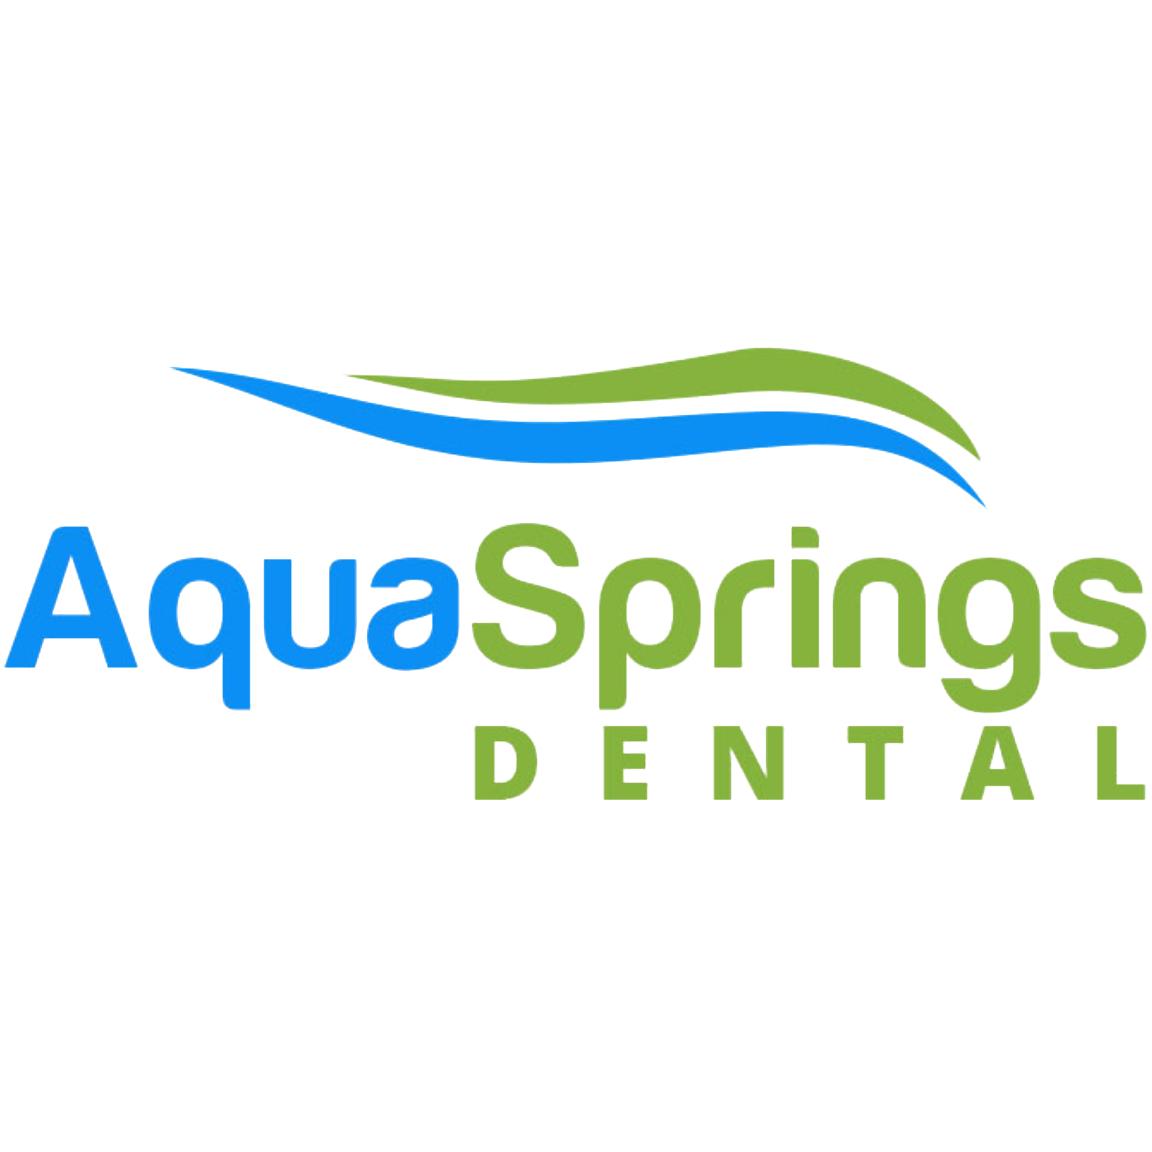 AquaSprings Dental San Marcos, Tx